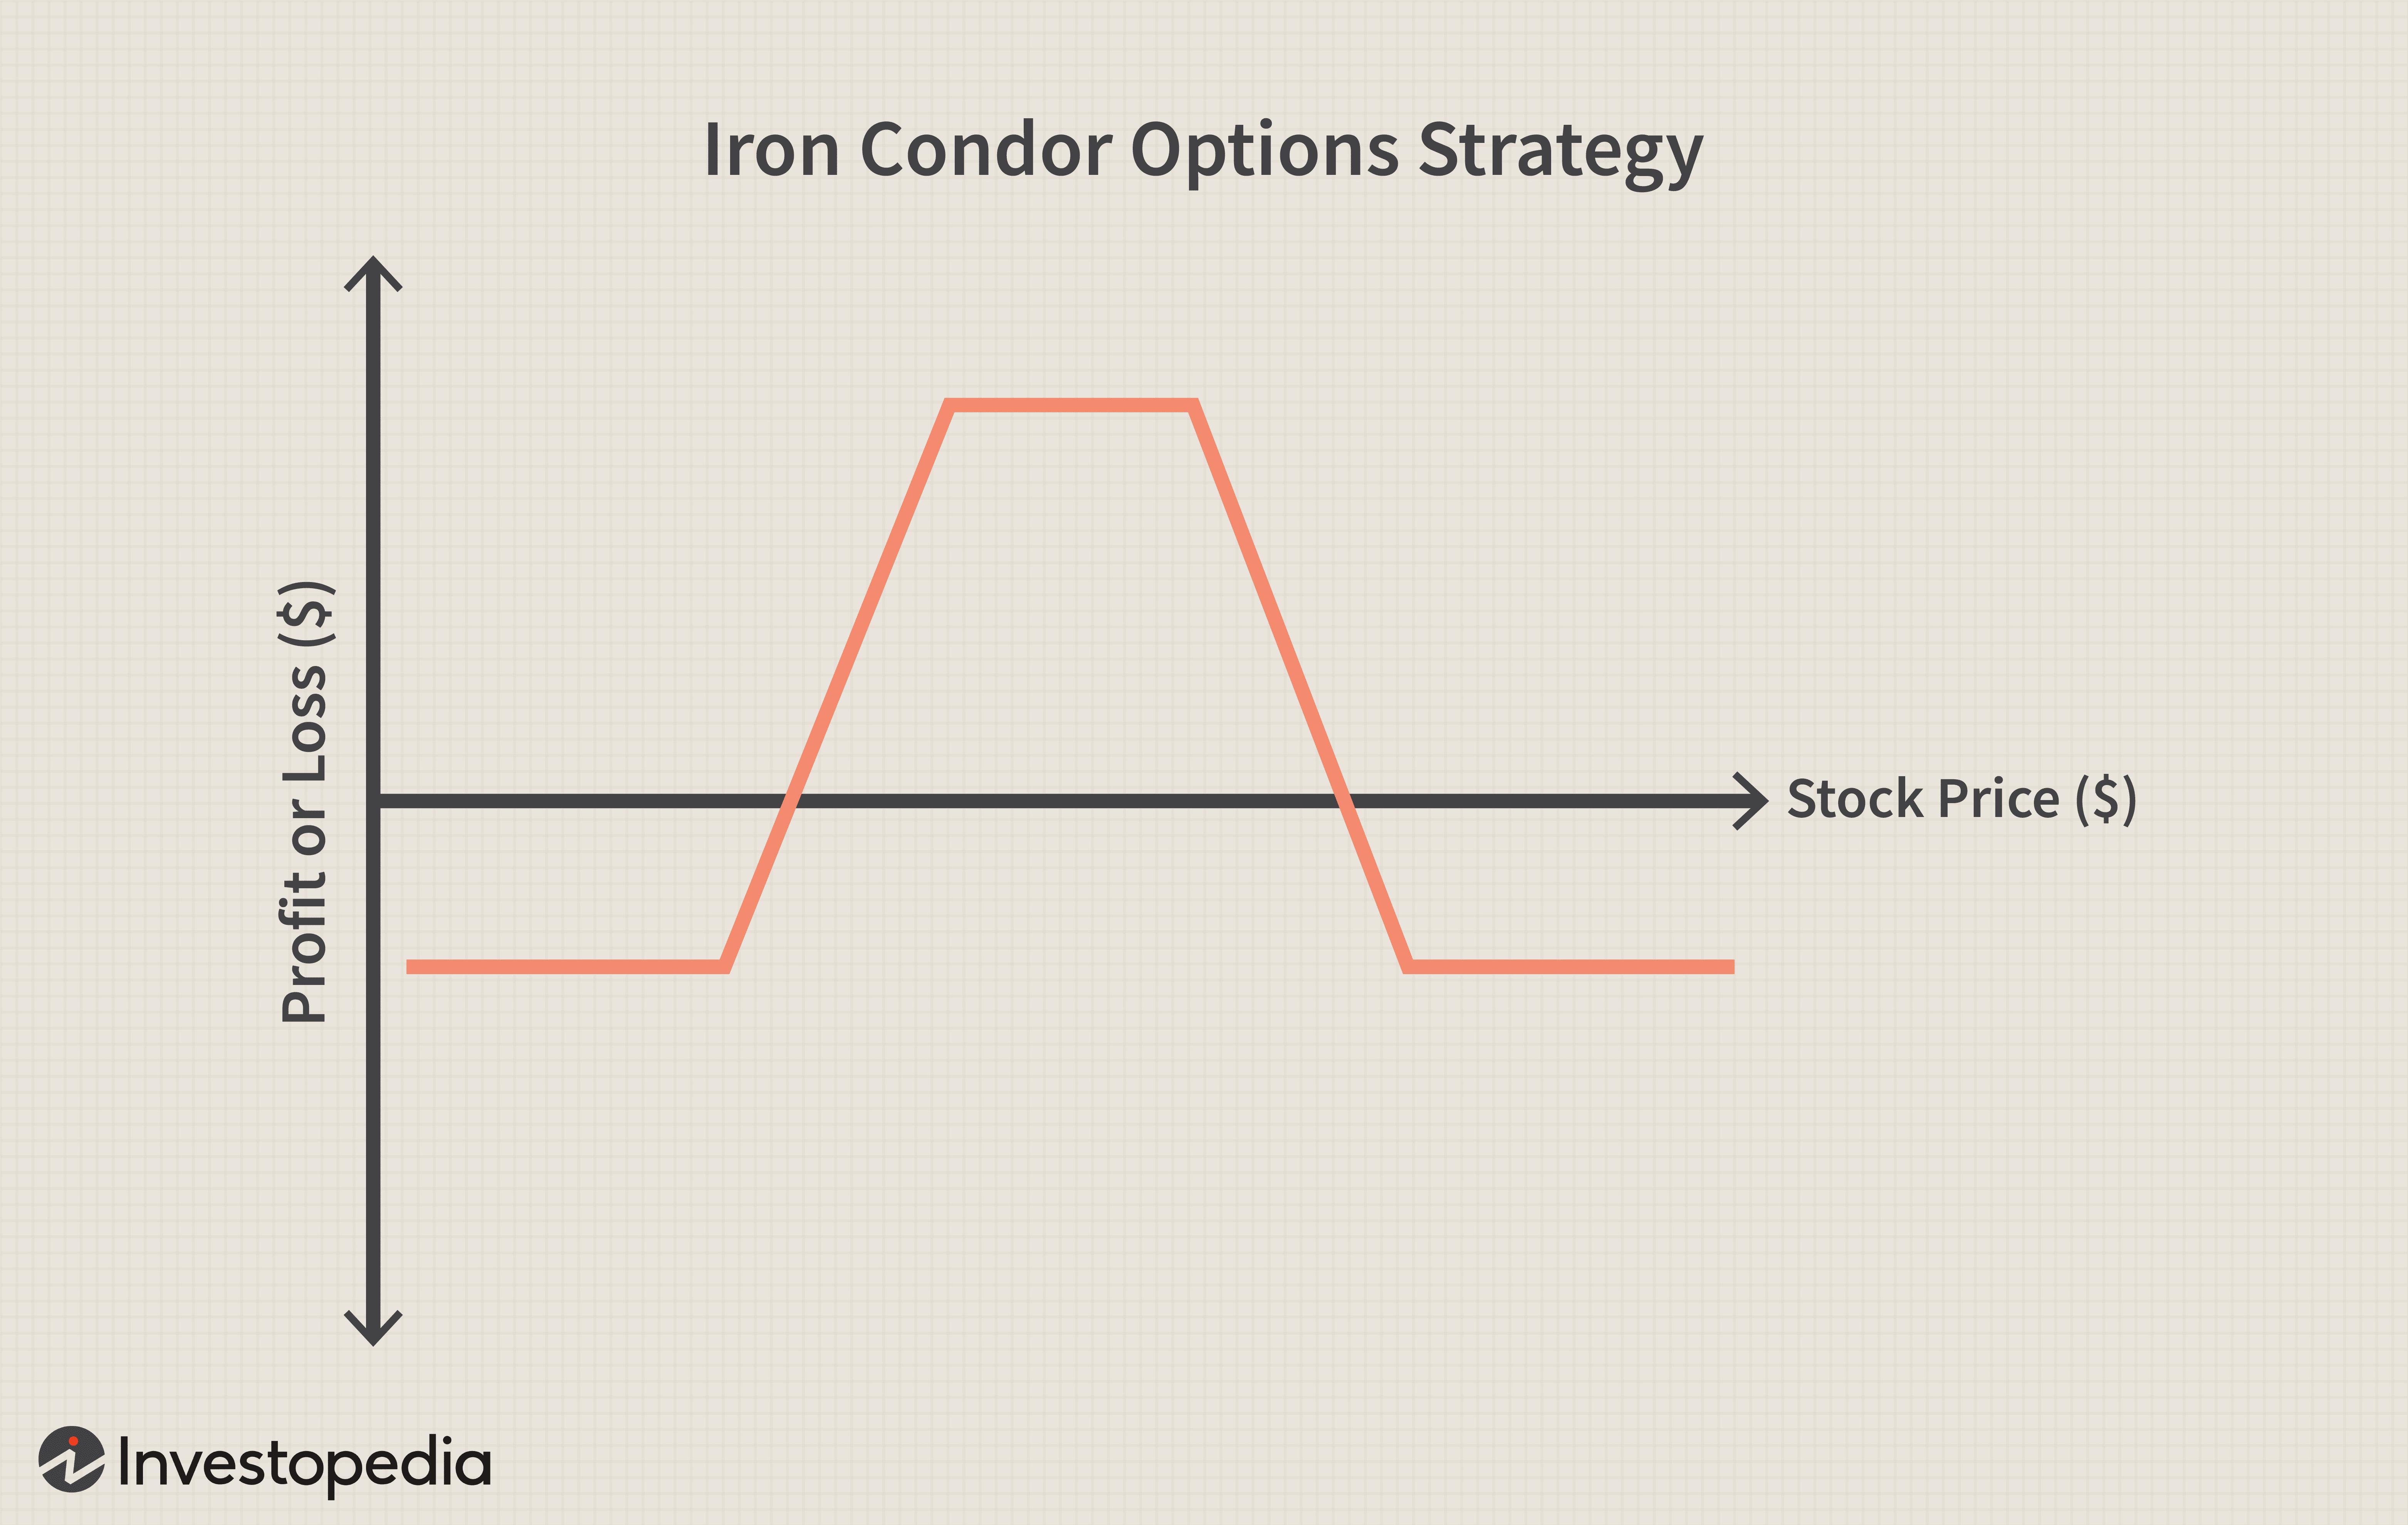 Iron Condor Options Strategy